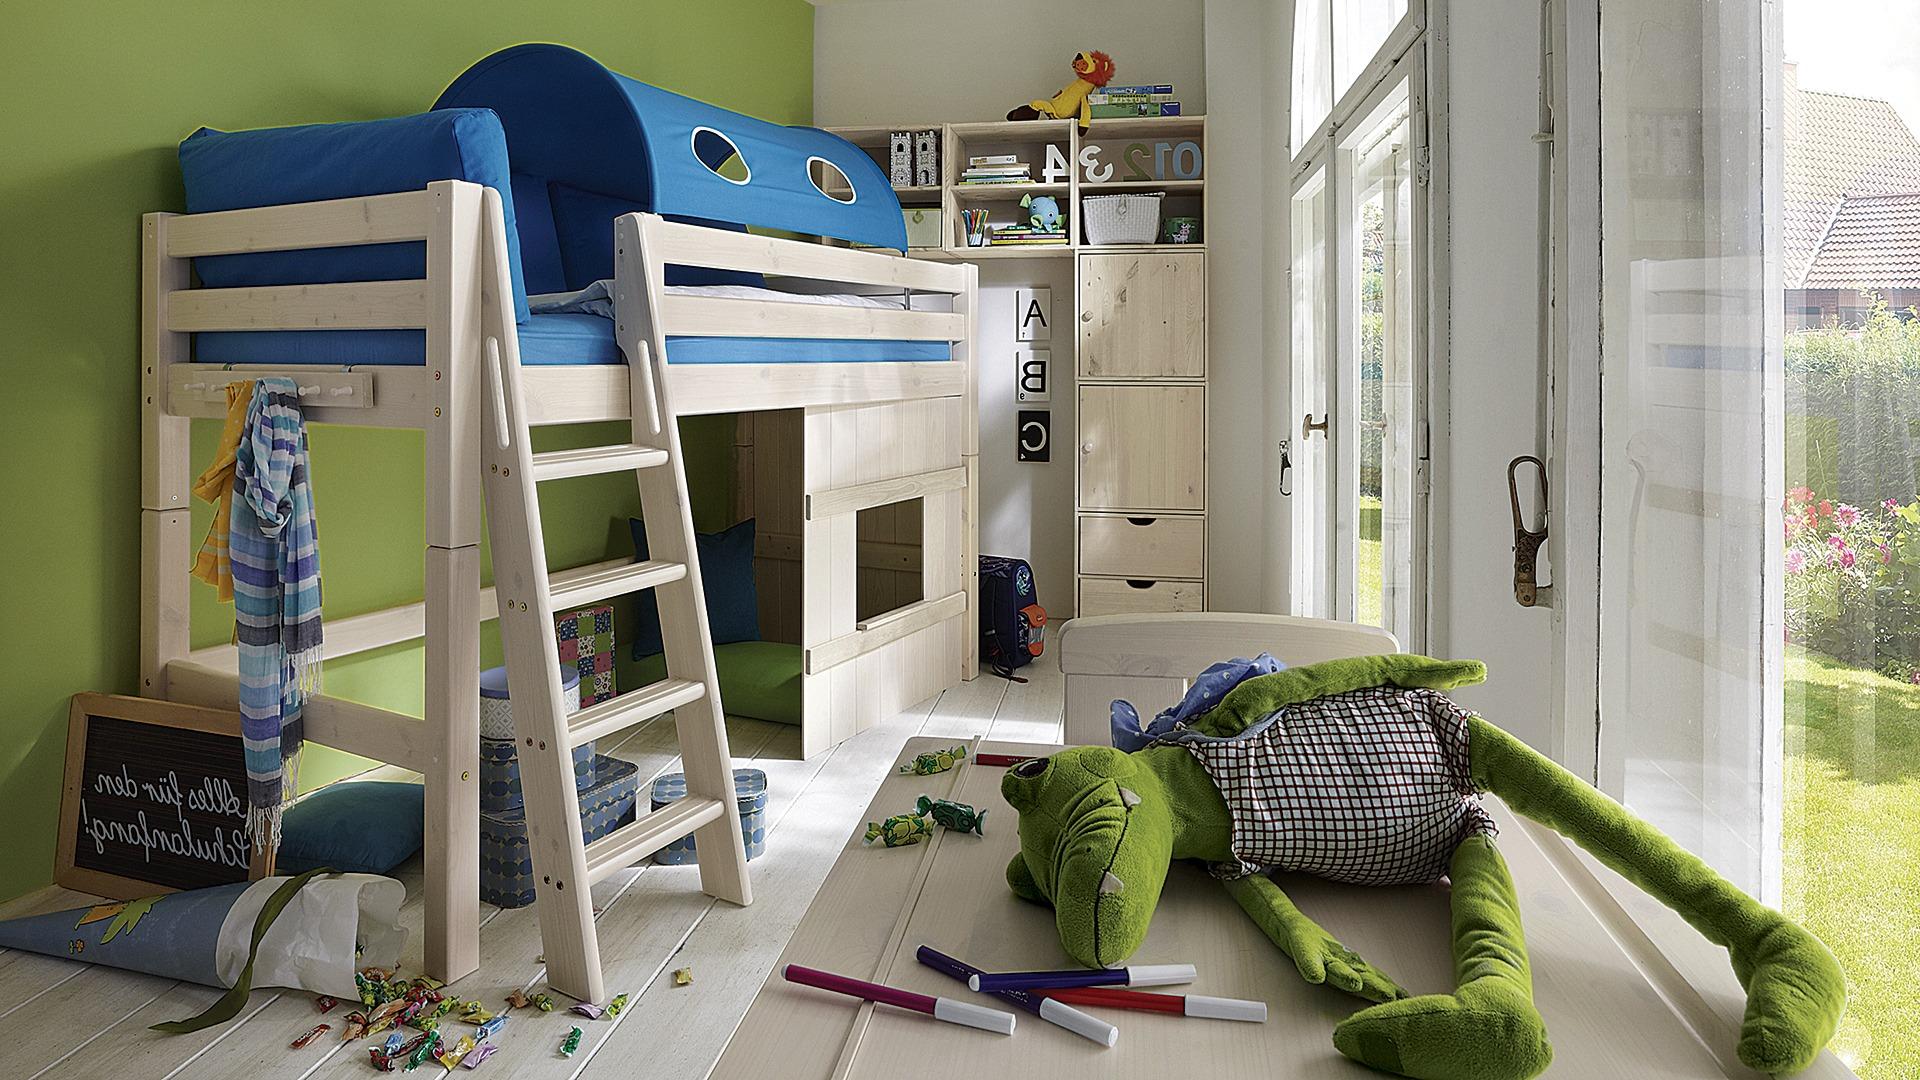 holzverkleidung f r mittel hochbett kiddy. Black Bedroom Furniture Sets. Home Design Ideas